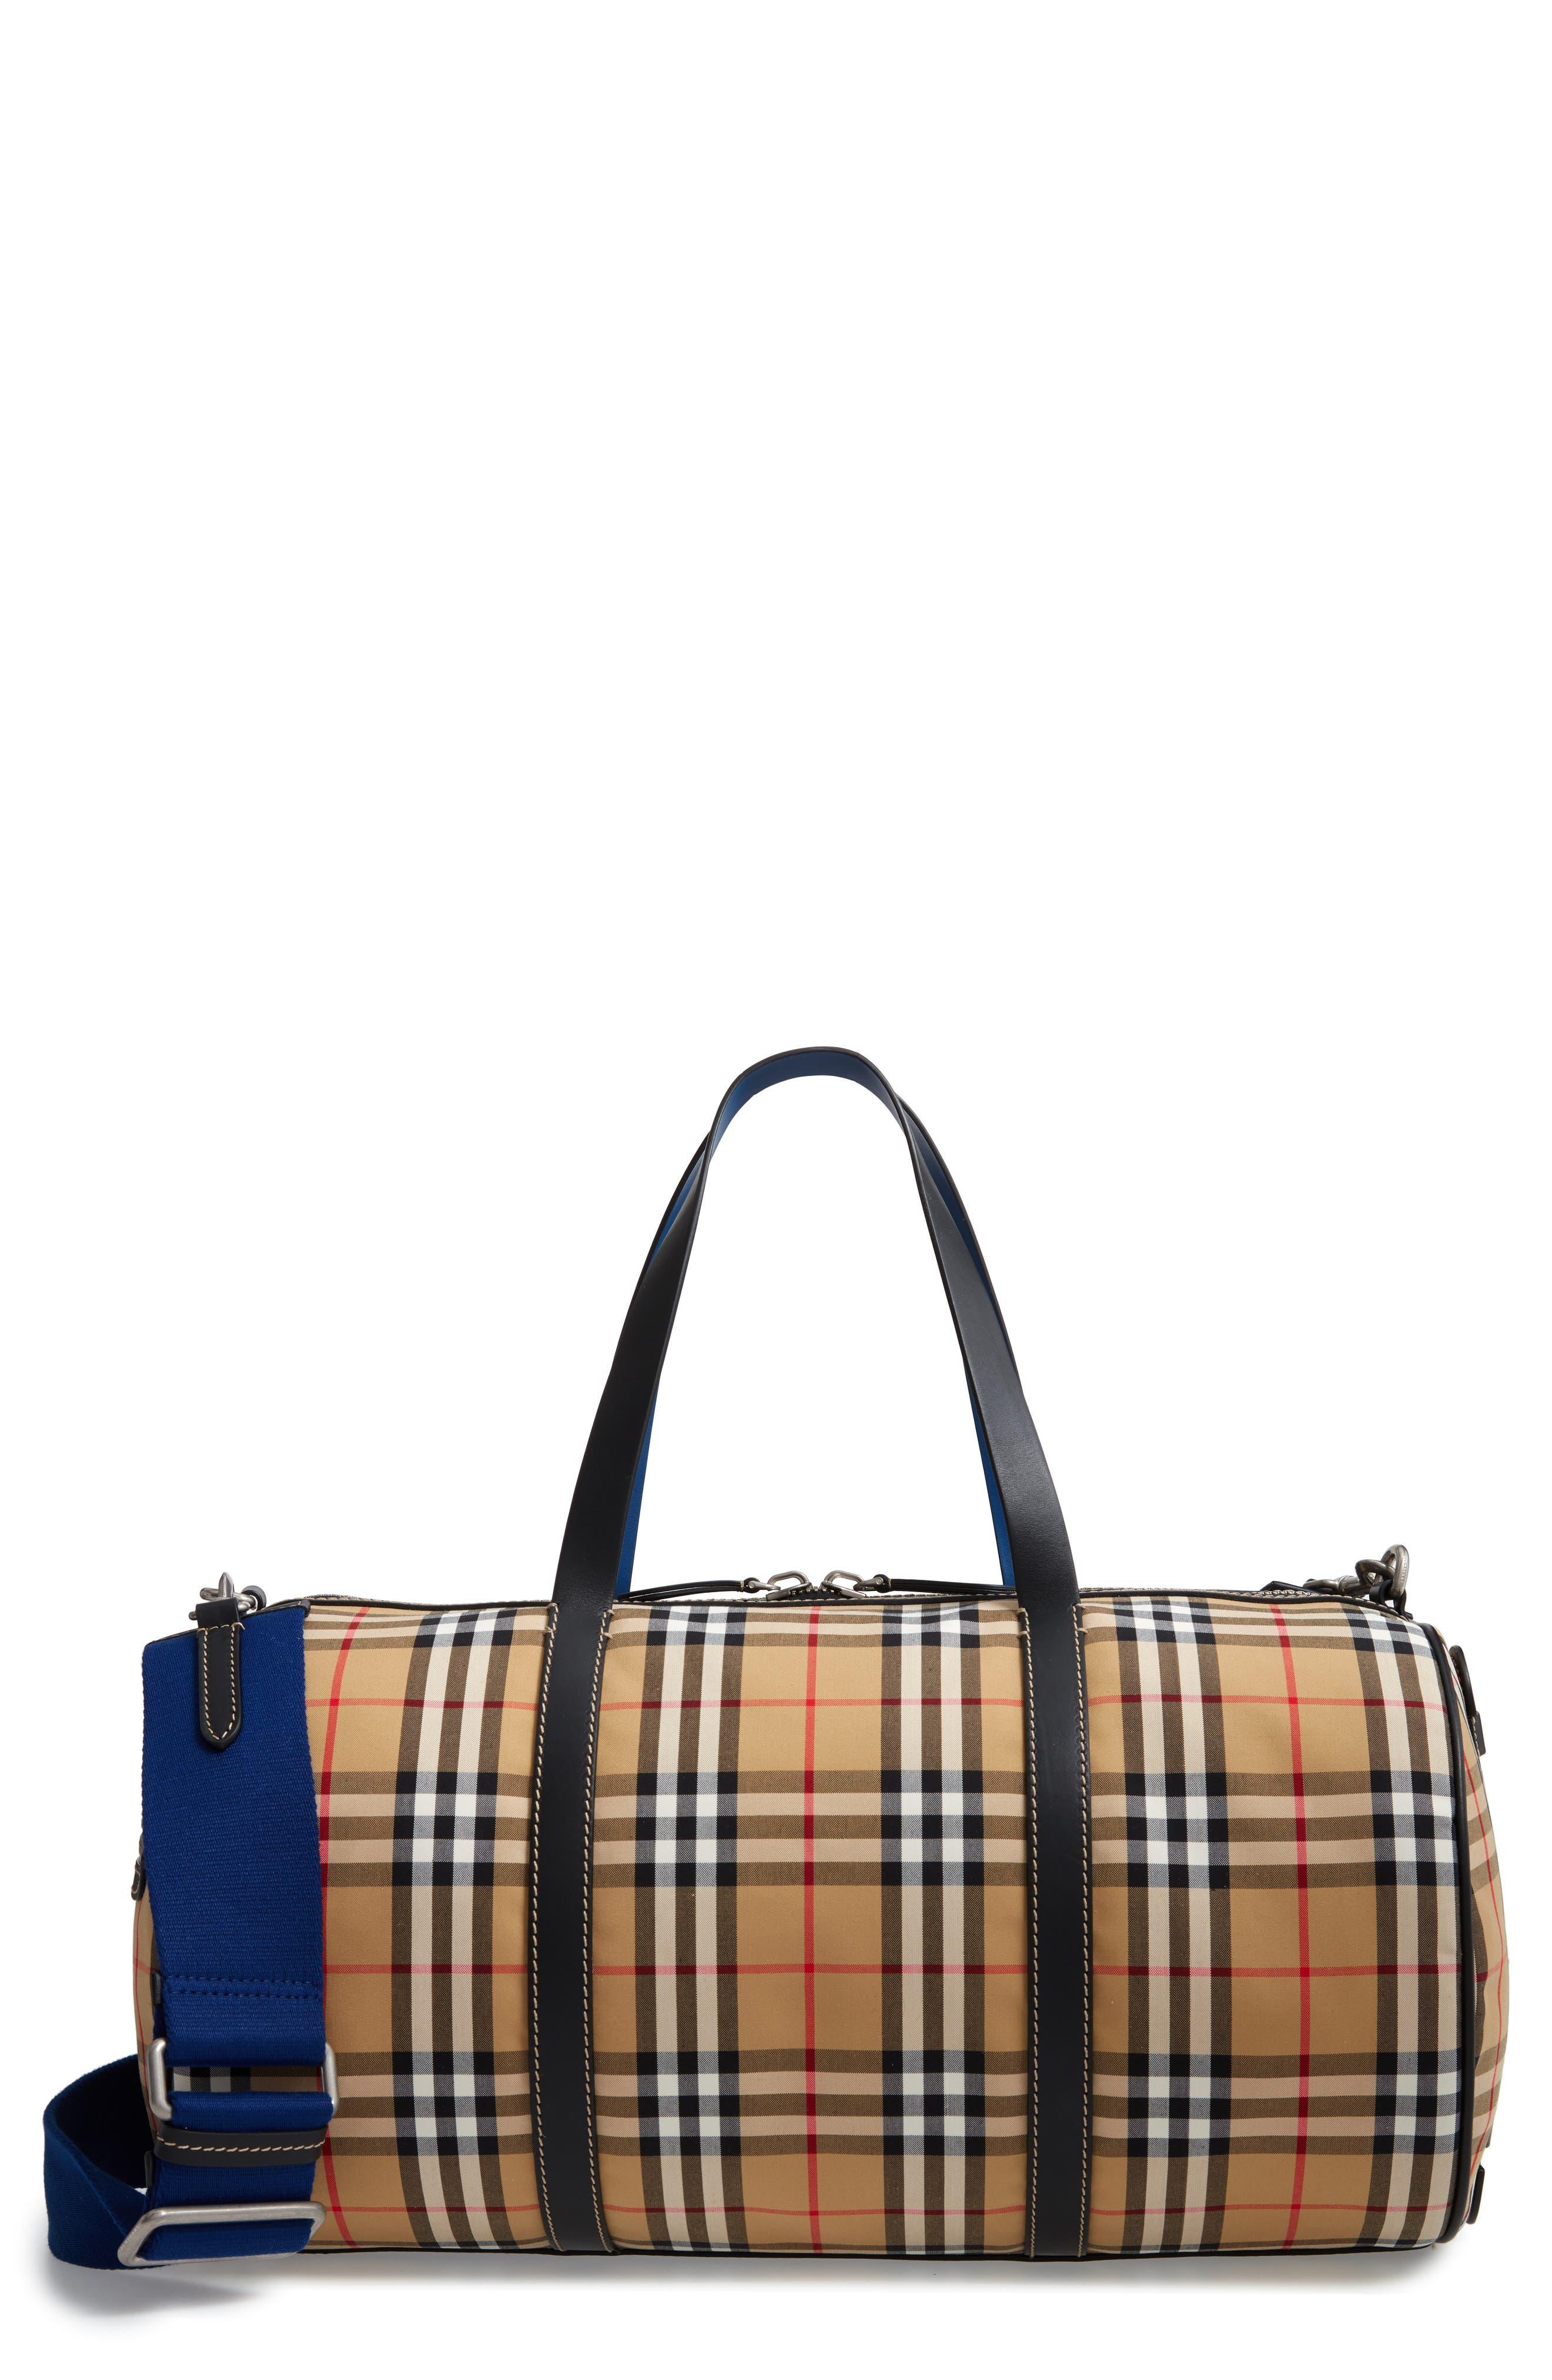 b161c97824e8 Burberry Medium Kennedy Vintage Check Duffel Bag - Blue